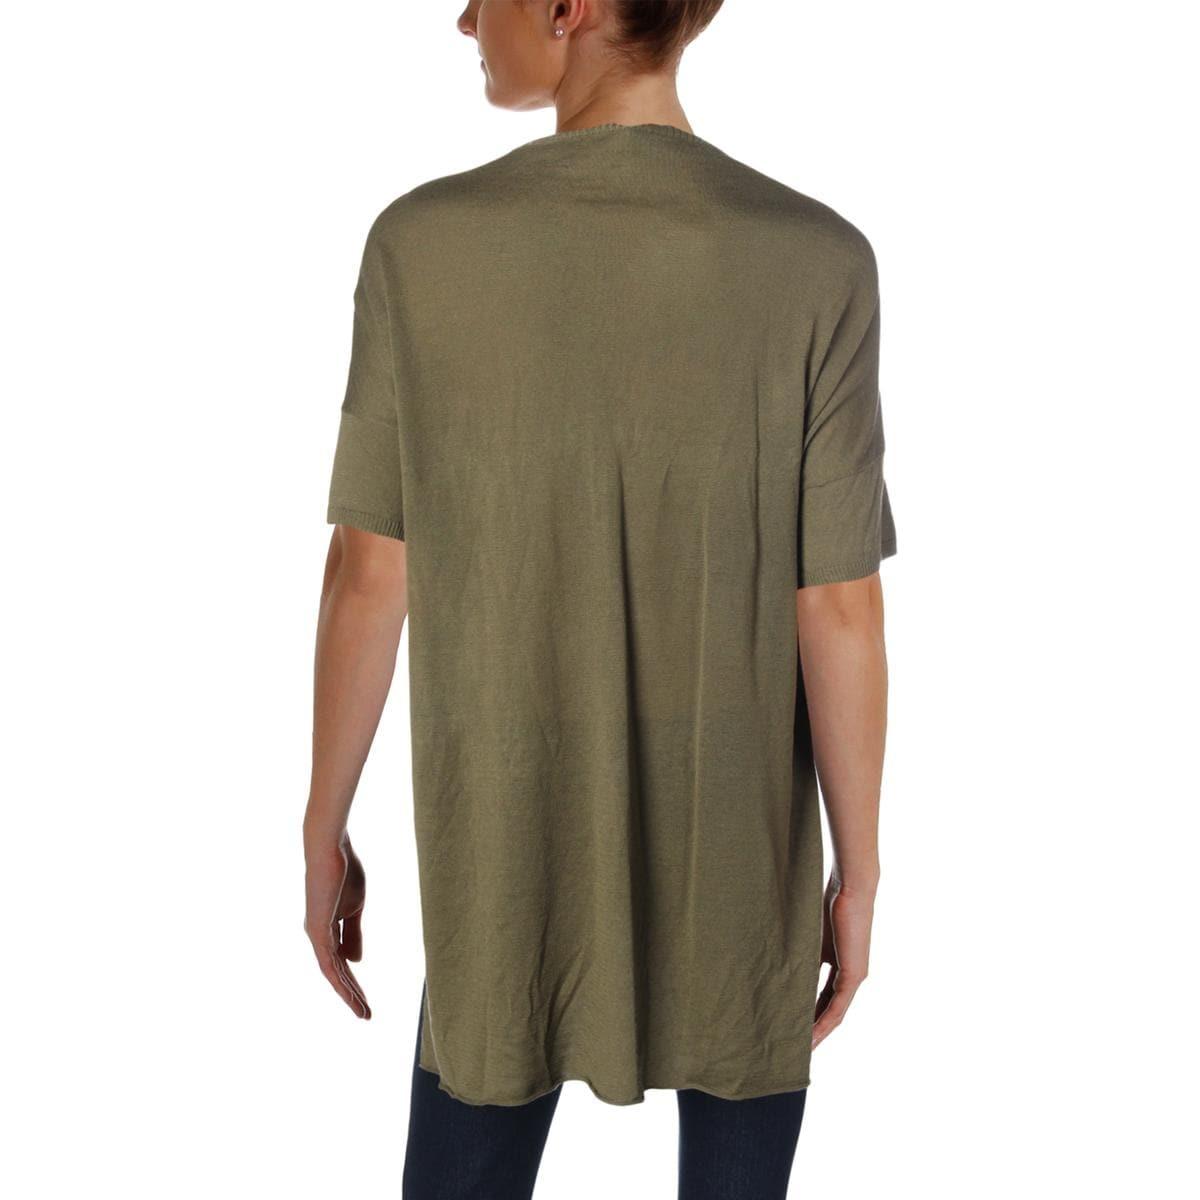 de7d9f7e21 Shop Eileen Fisher Womens Tunic Sweater Organic Linen High-Low - Free  Shipping Today - Overstock - 25688750